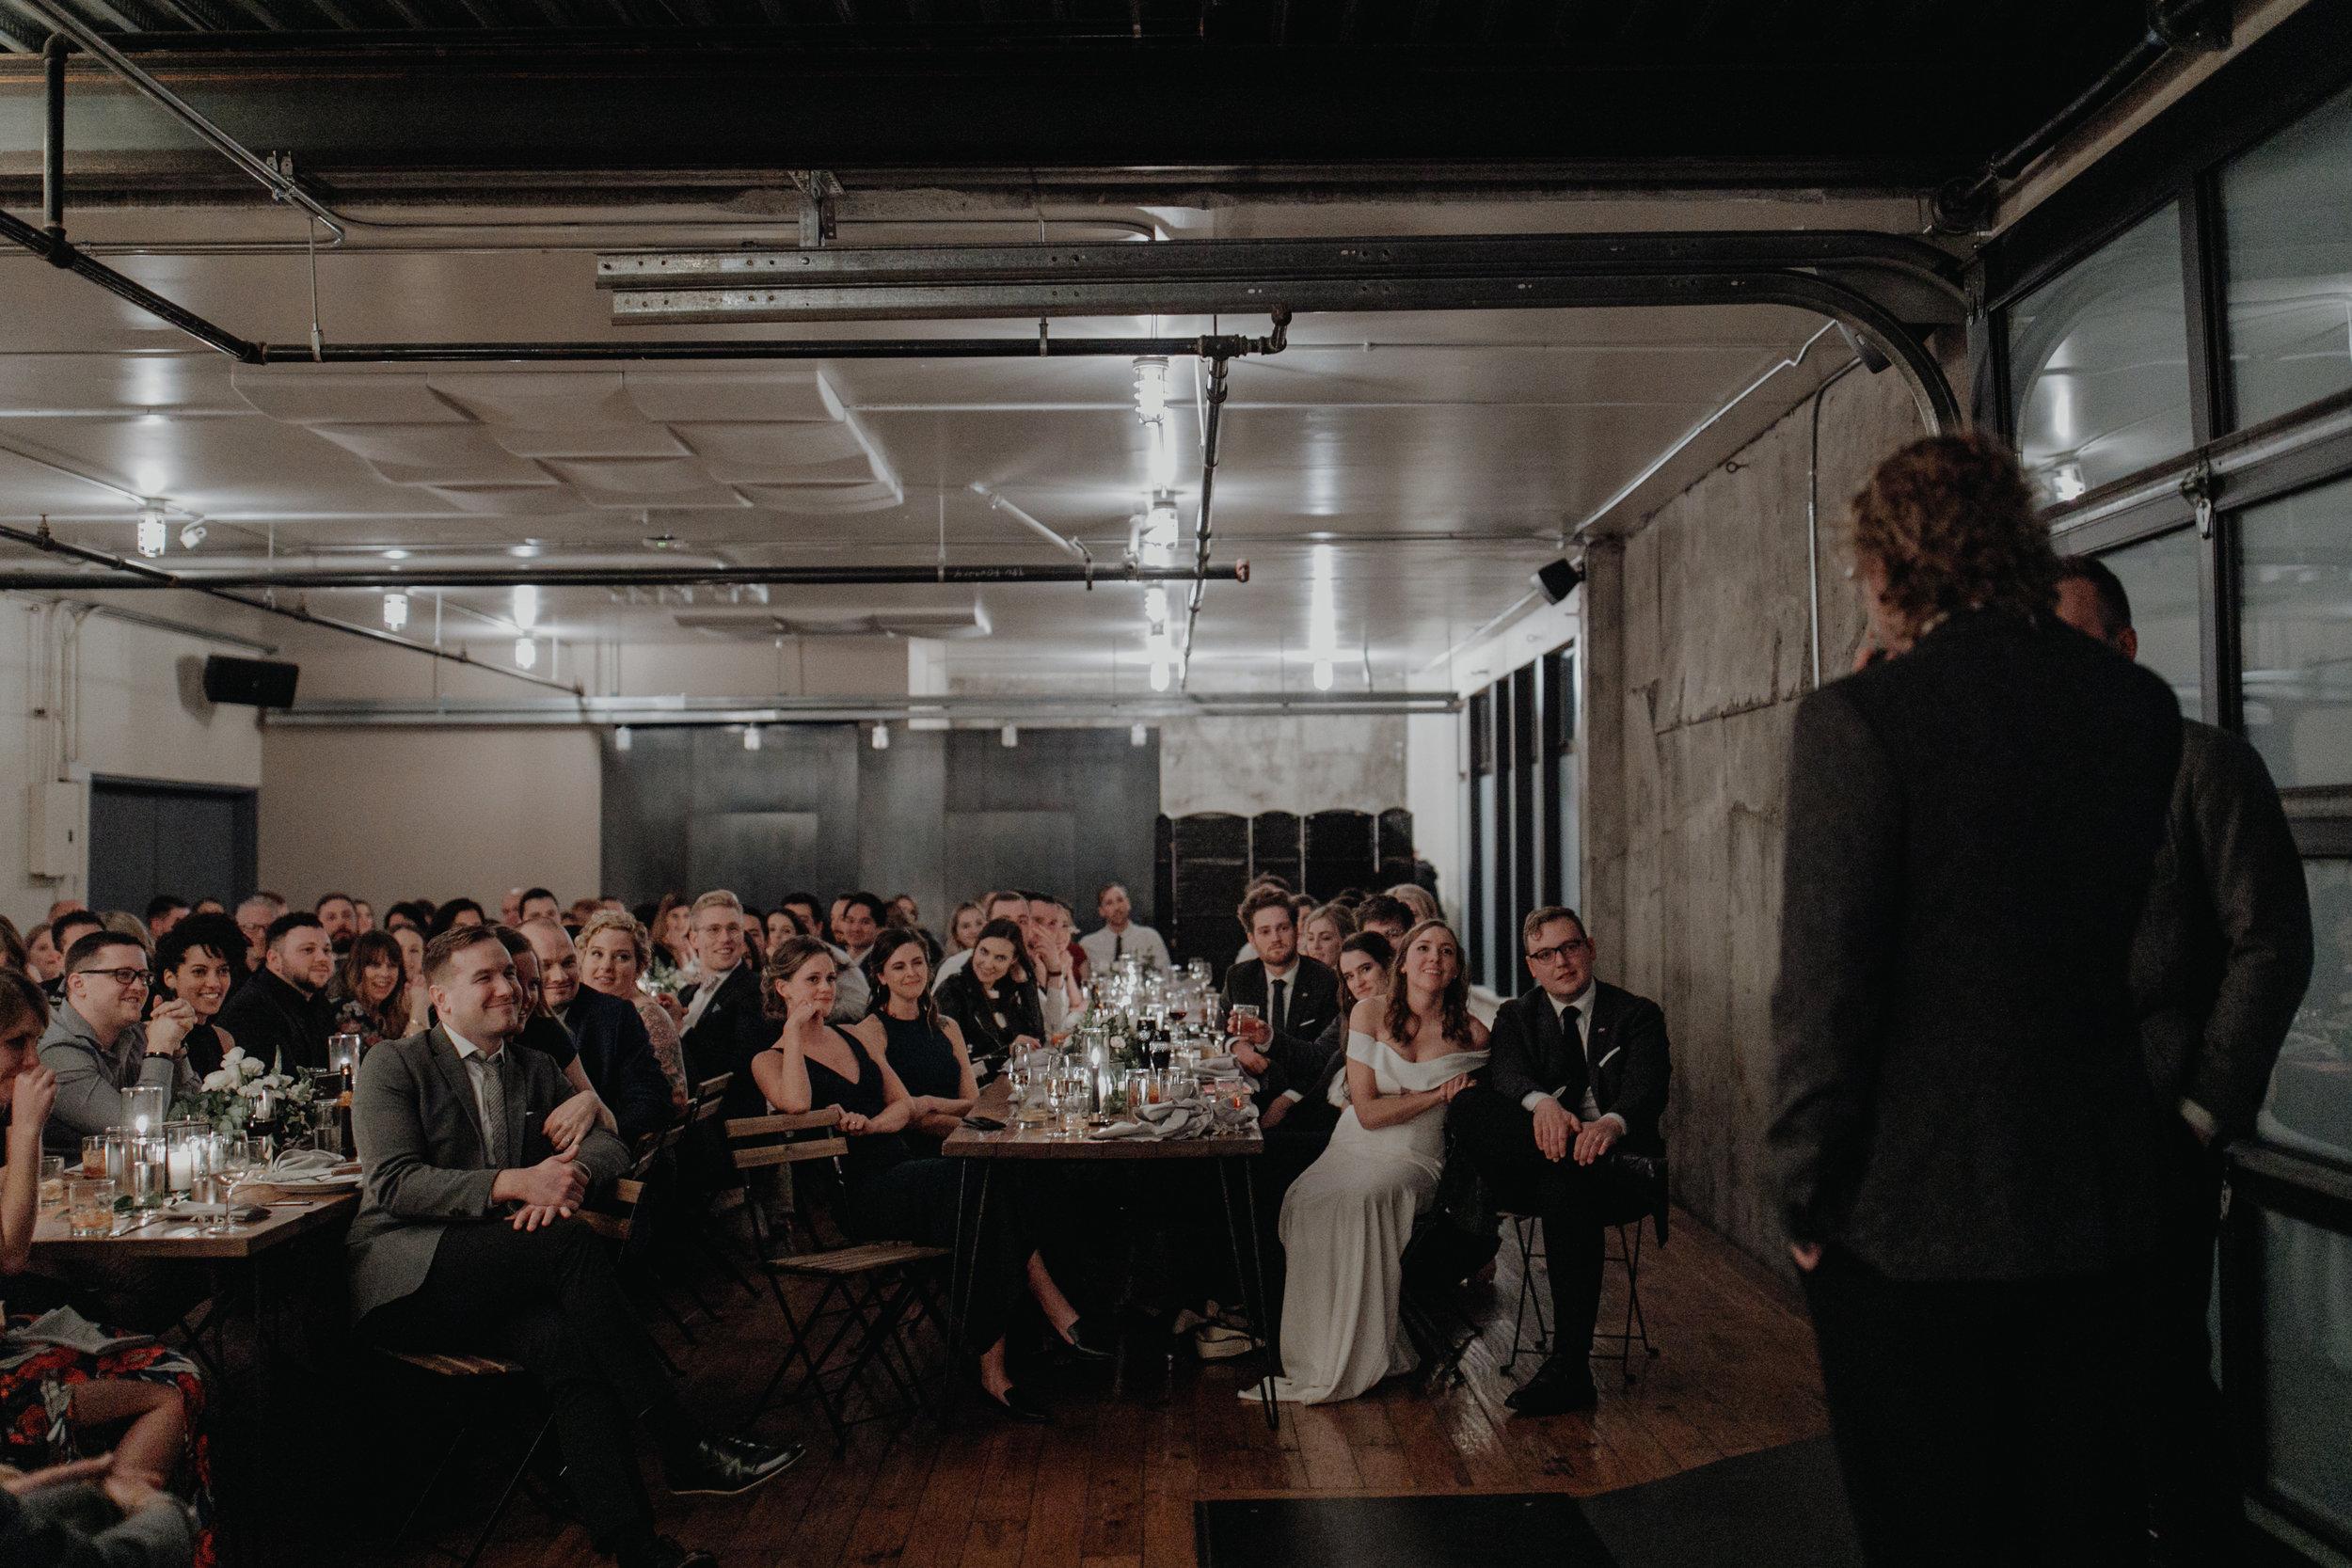 fremont_foundry_seattle_wedding_oliviastrohm___-4.jpg